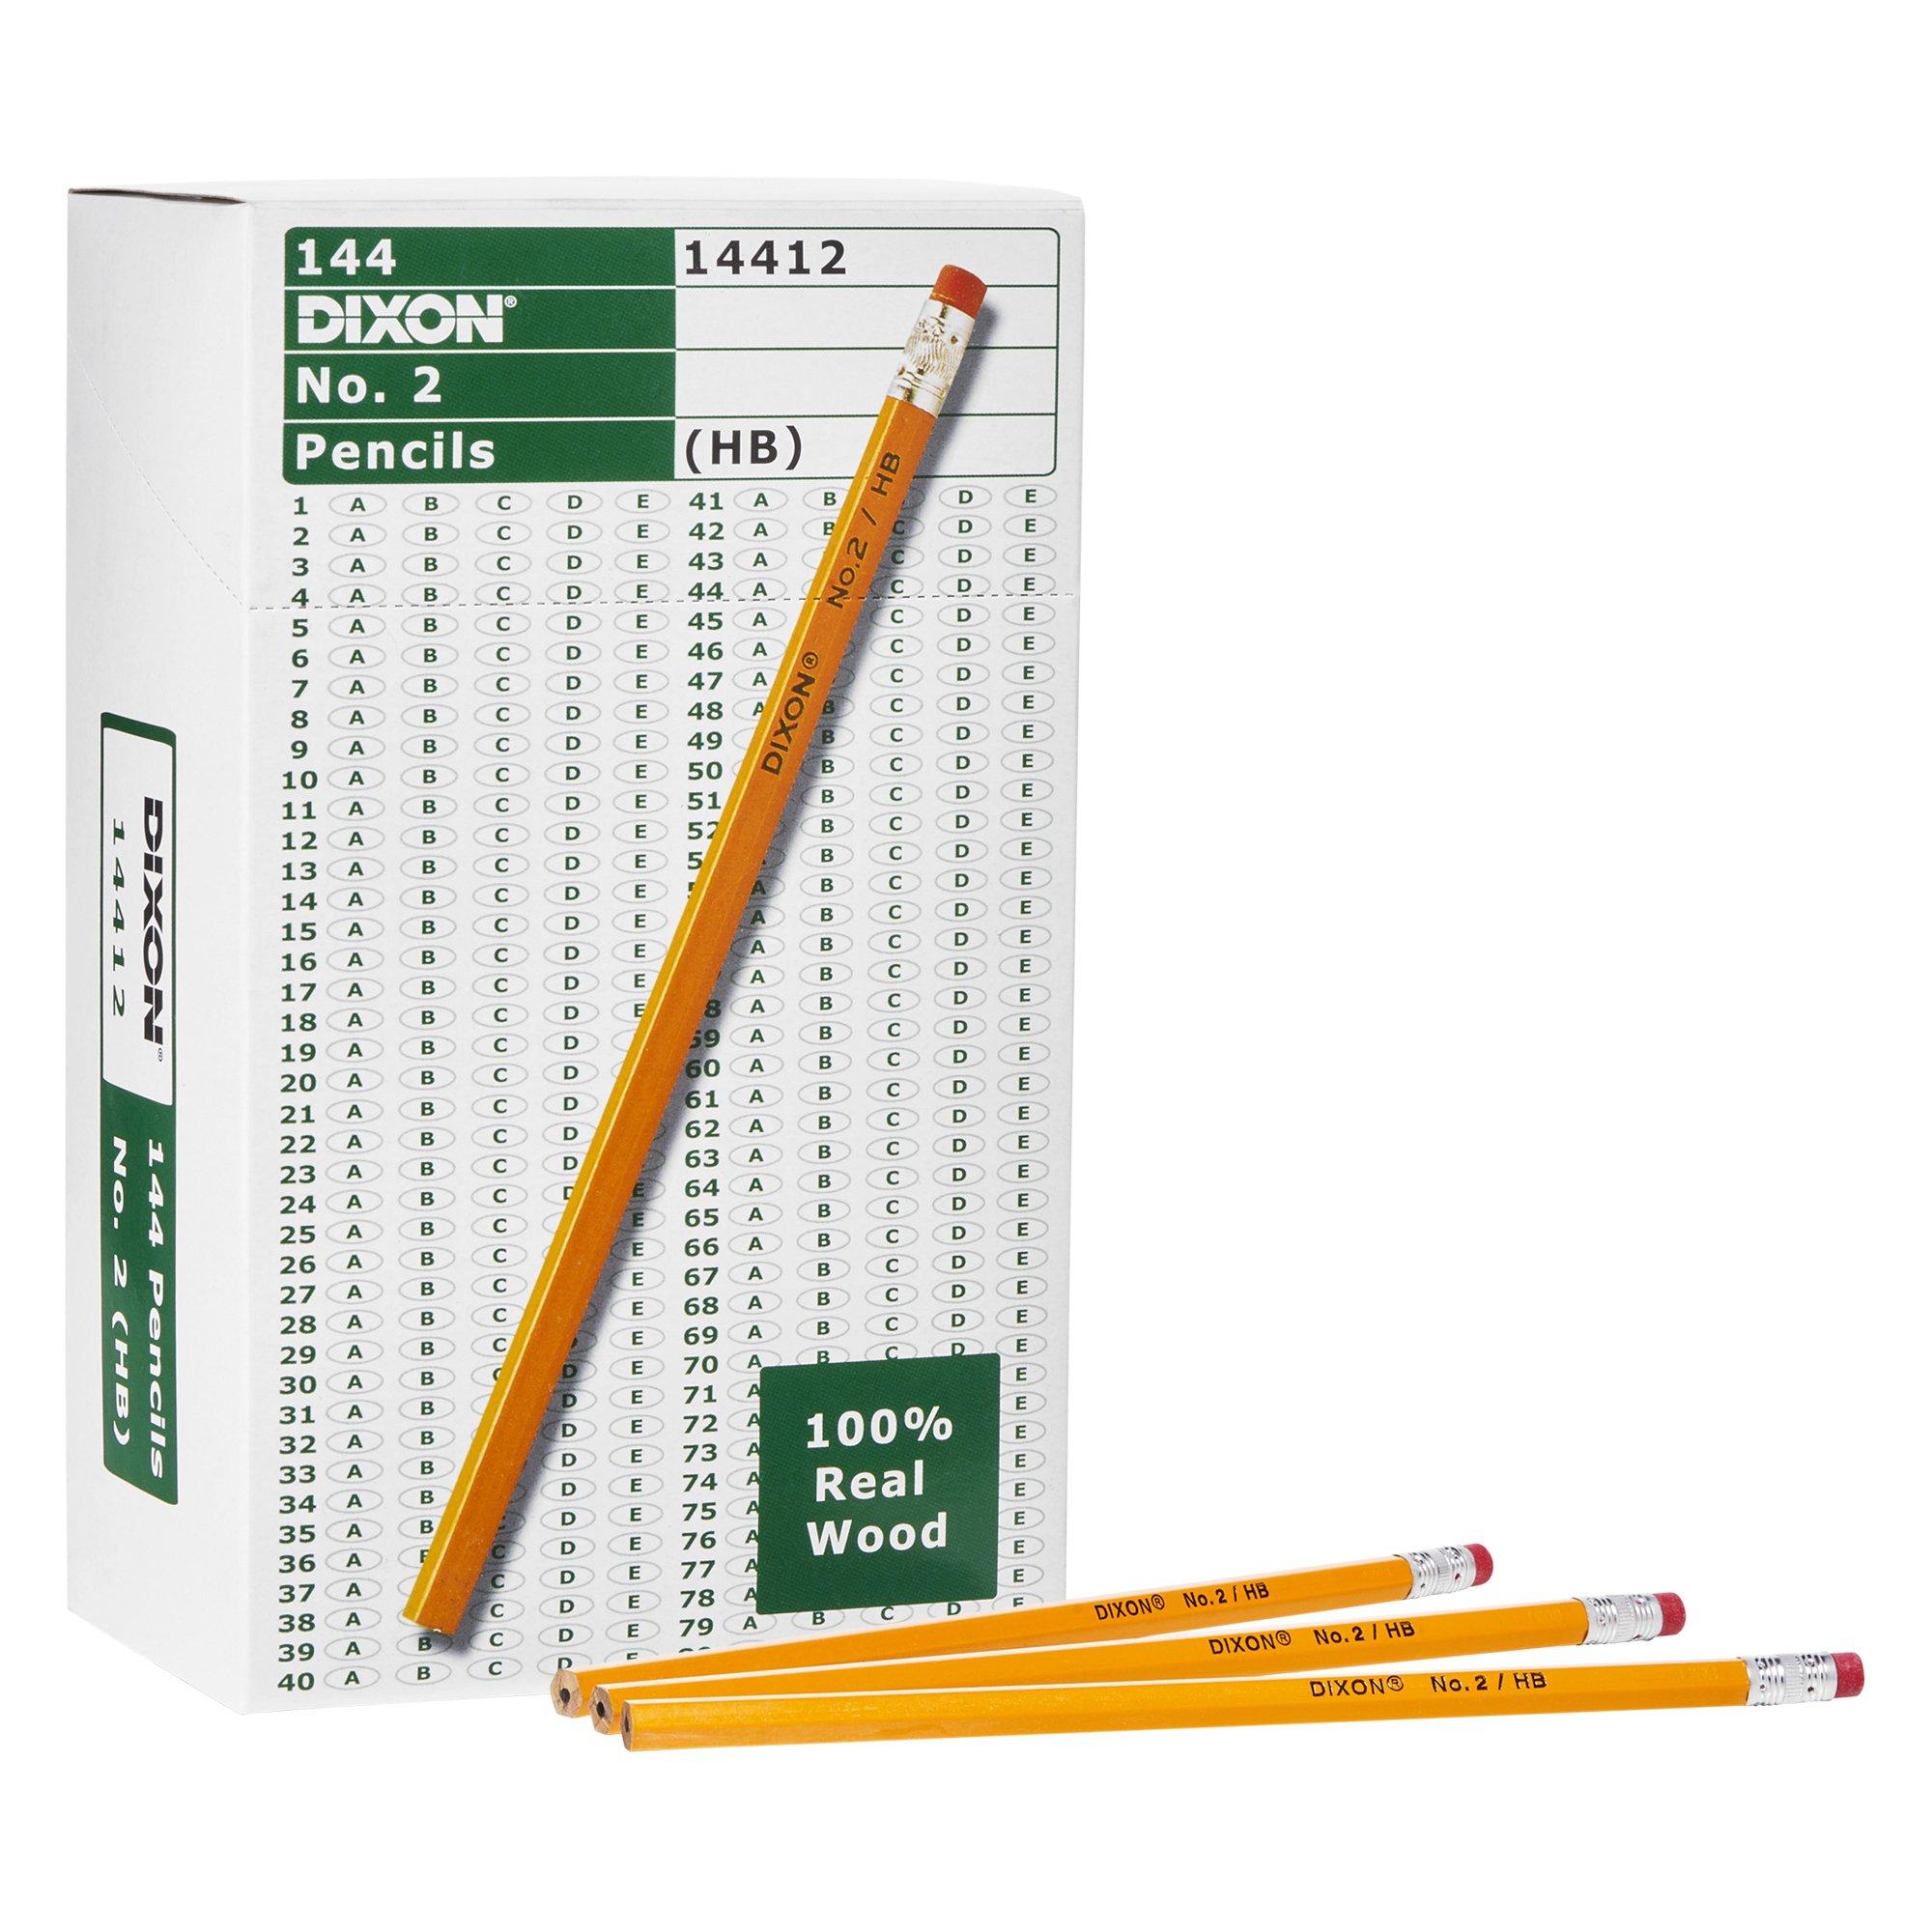 Dixon Wood-Cased Graphite Pencils, #2 HB Soft, Yellow, 144 Count (14412) by Dixon (Image #2)